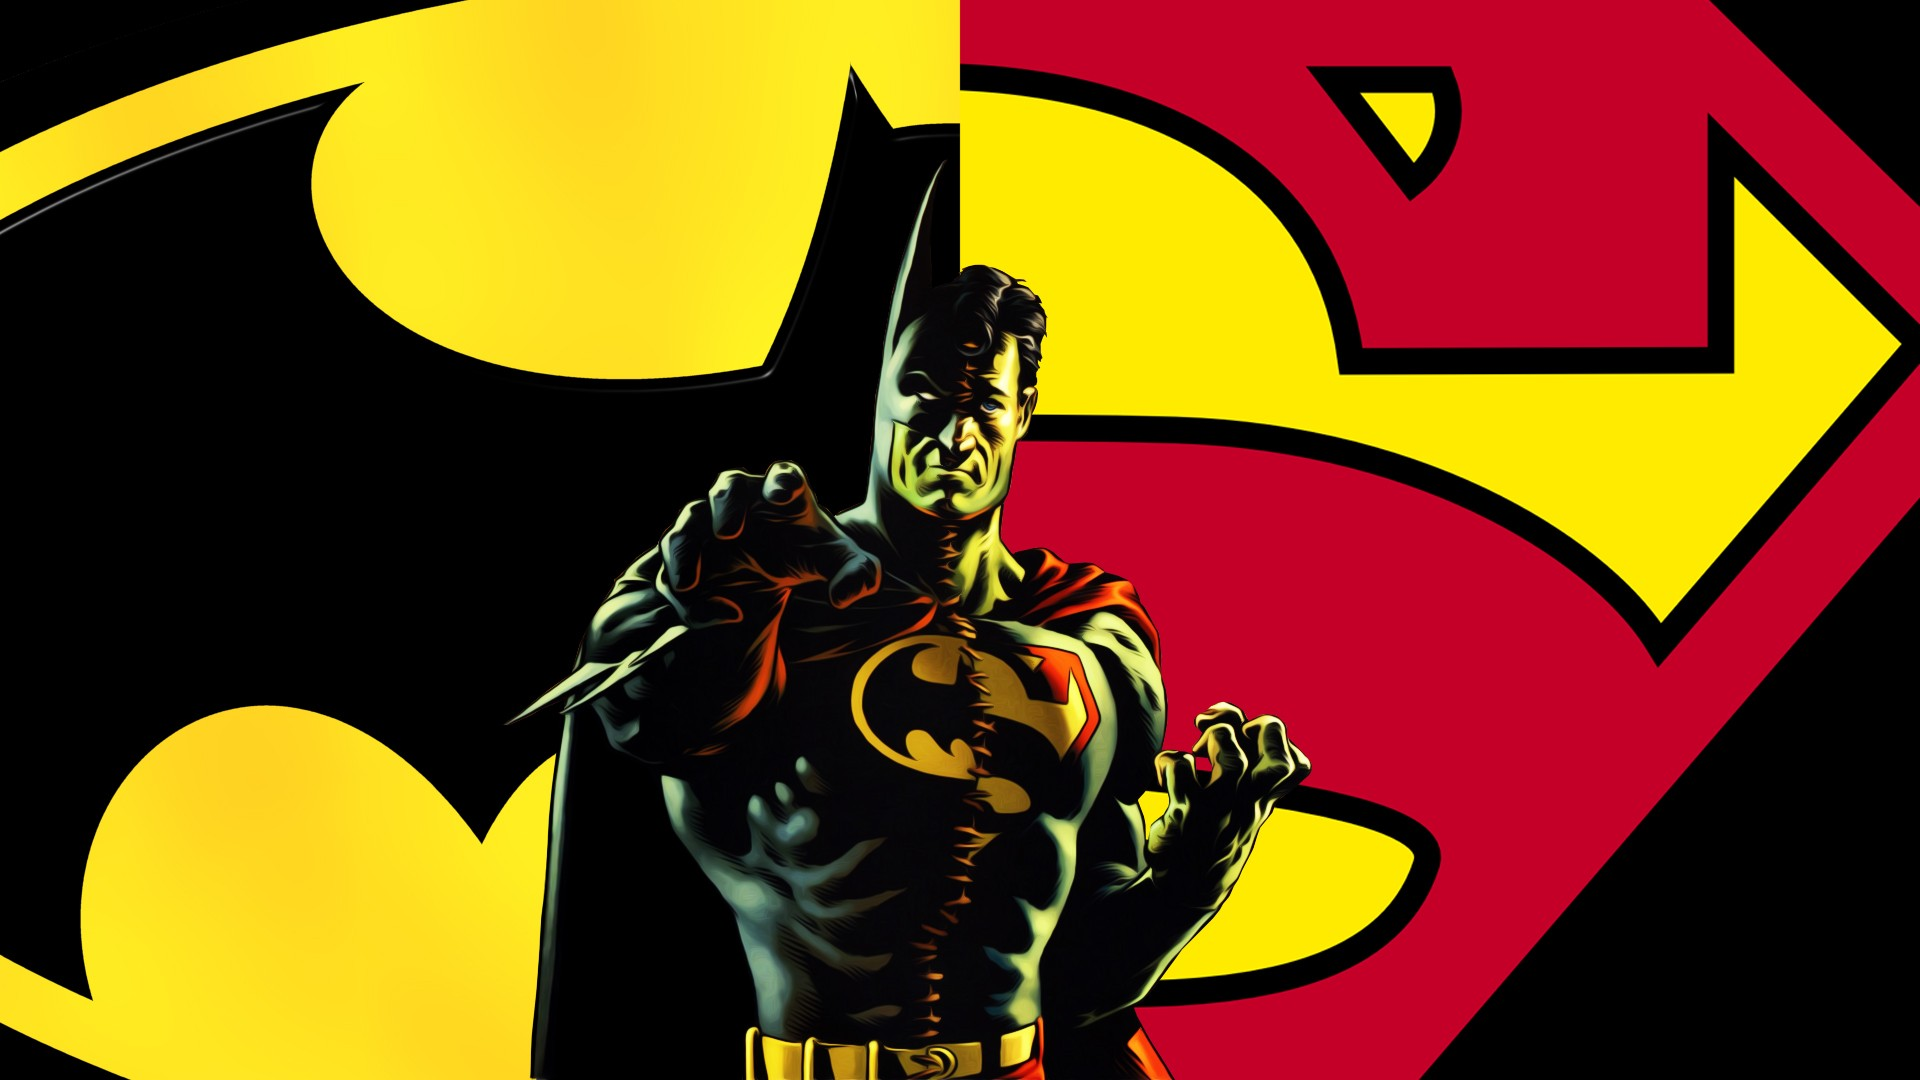 Batman vs superman symbol wallpaper wallpapersafari batman superman3 buycottarizona Gallery